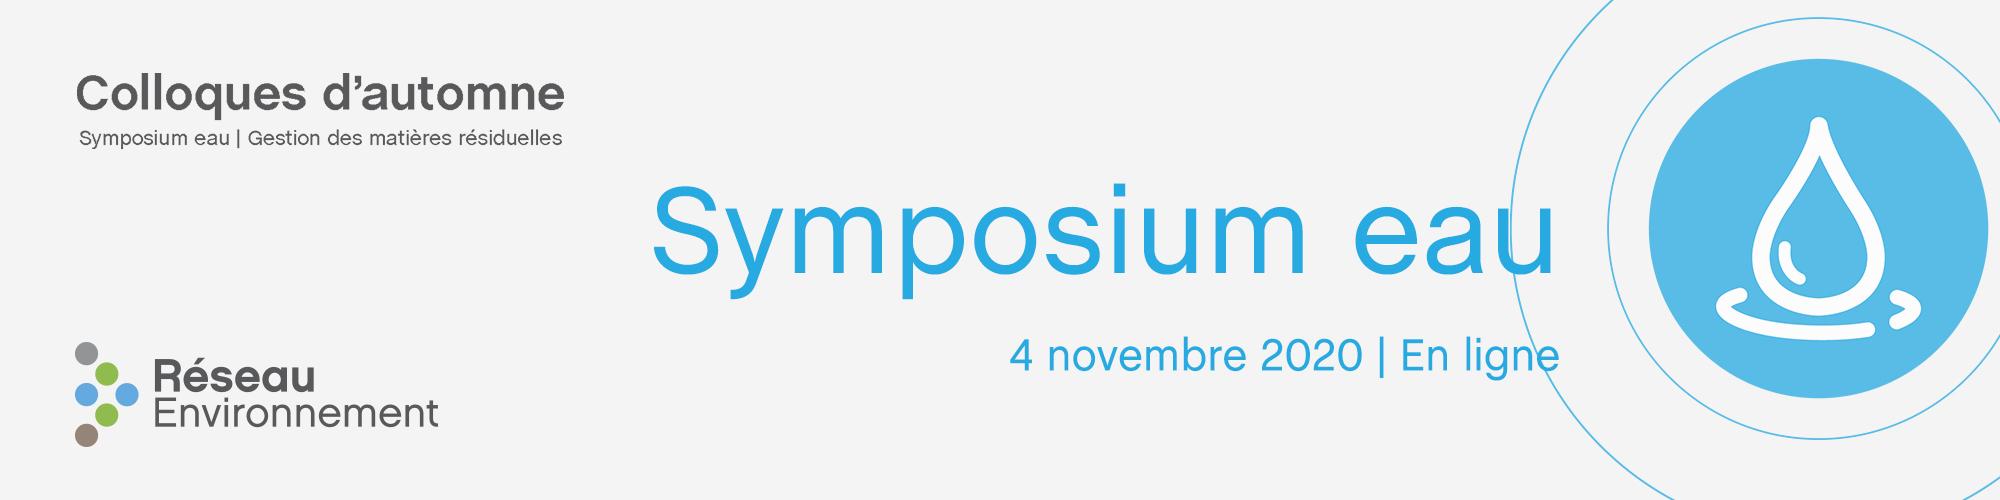 Symposium eau